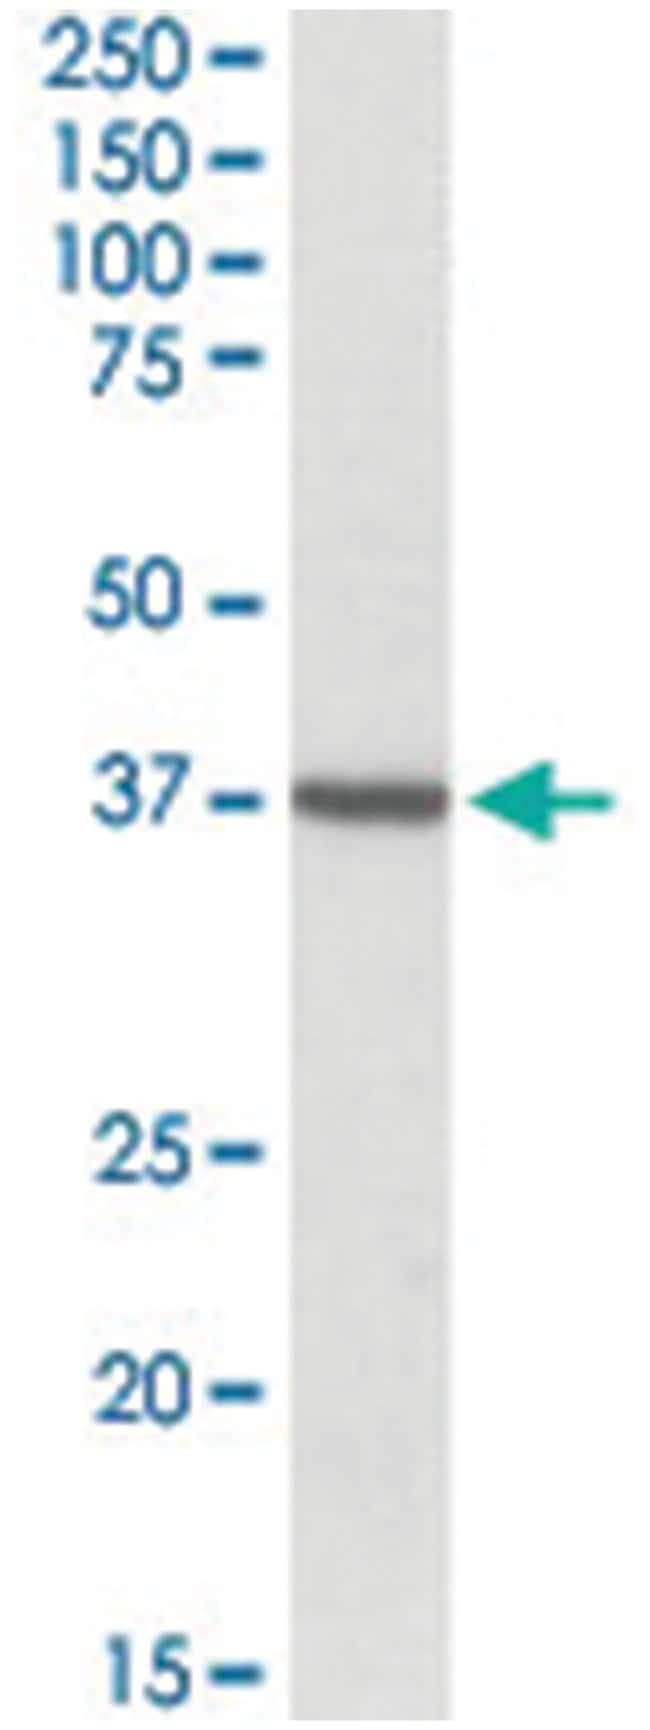 TOMM40, Goat, Polyclonal Antibody, Abnova 100µg; Unlabeled:Life Sciences